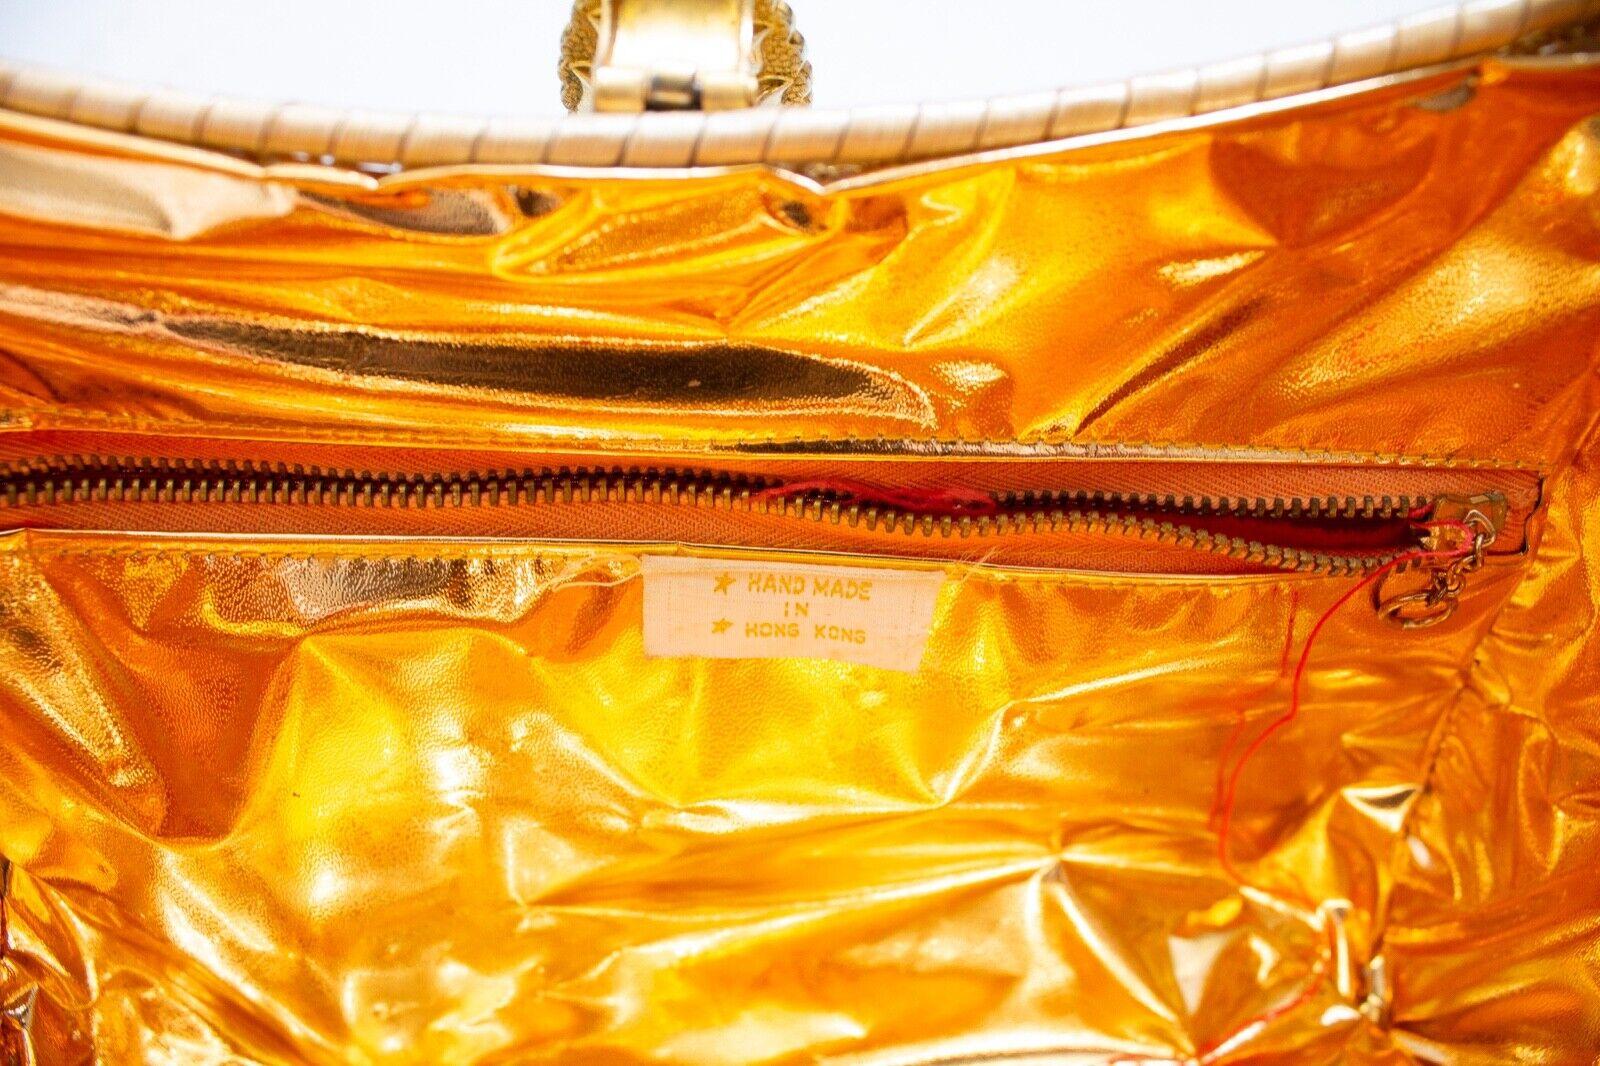 Vintage Basket Purse 1960s Gold Metal Woven Wicke… - image 9